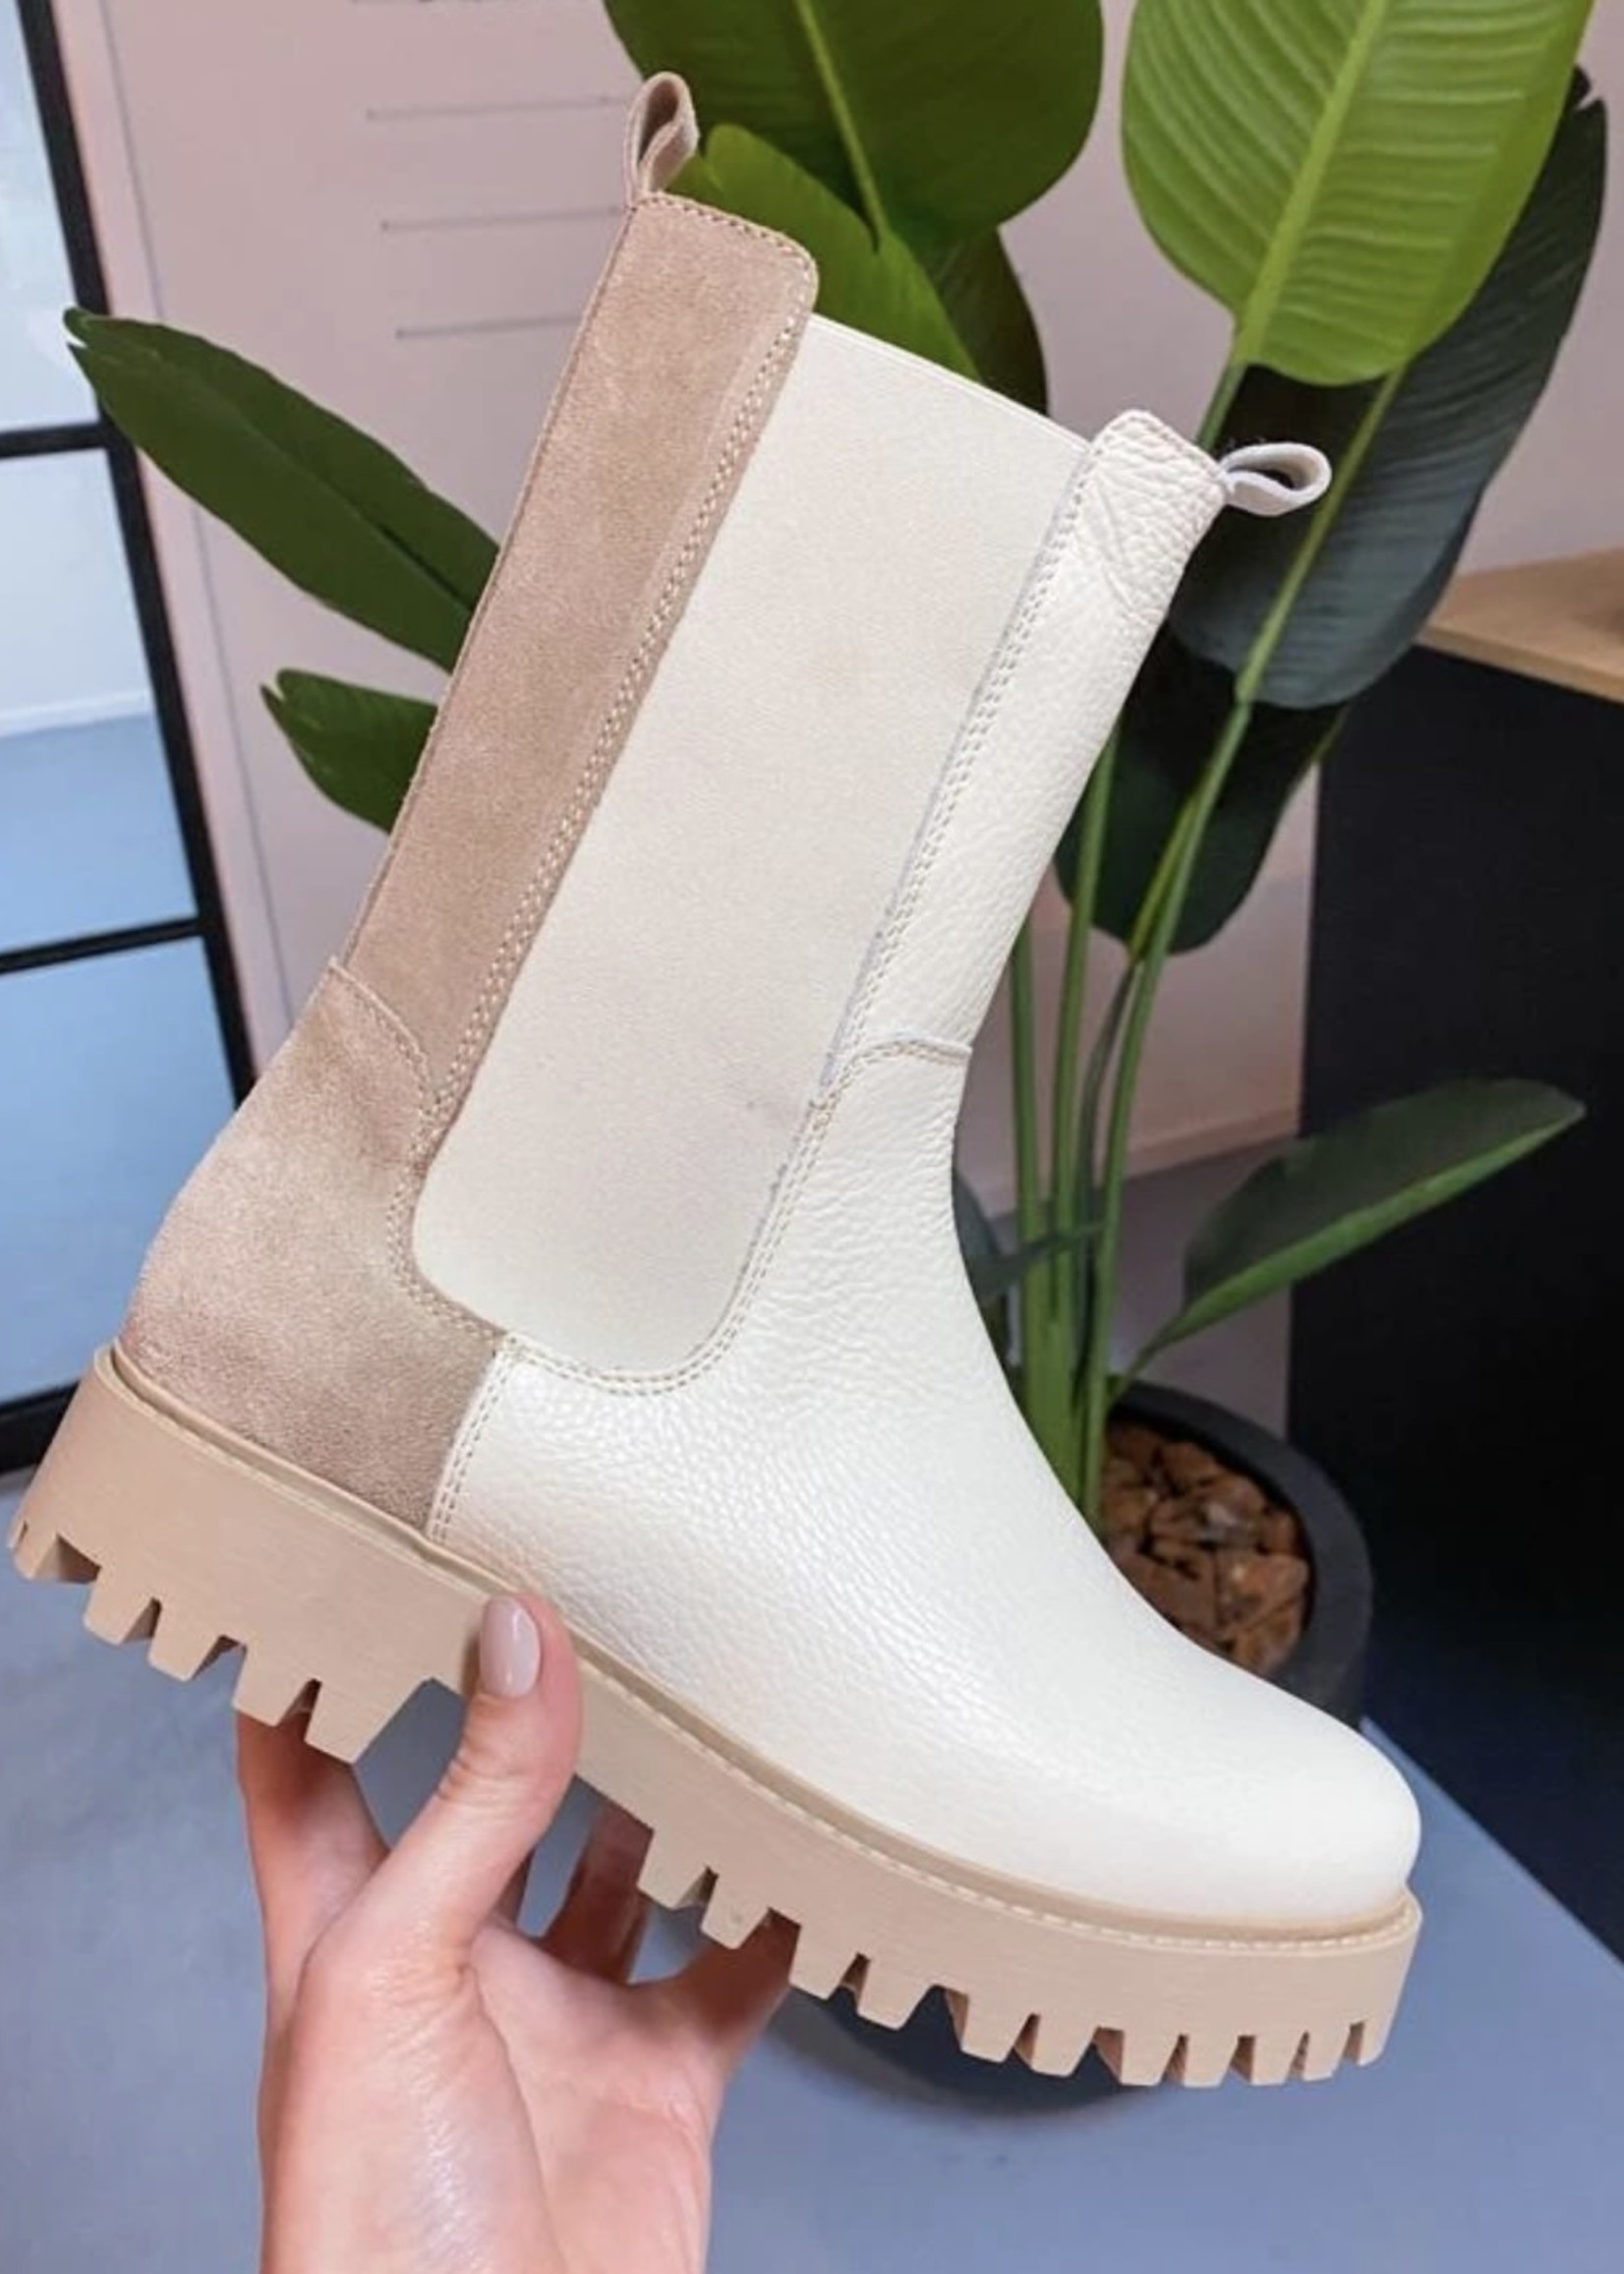 Guts & Goats Boochum Chelsea Boots